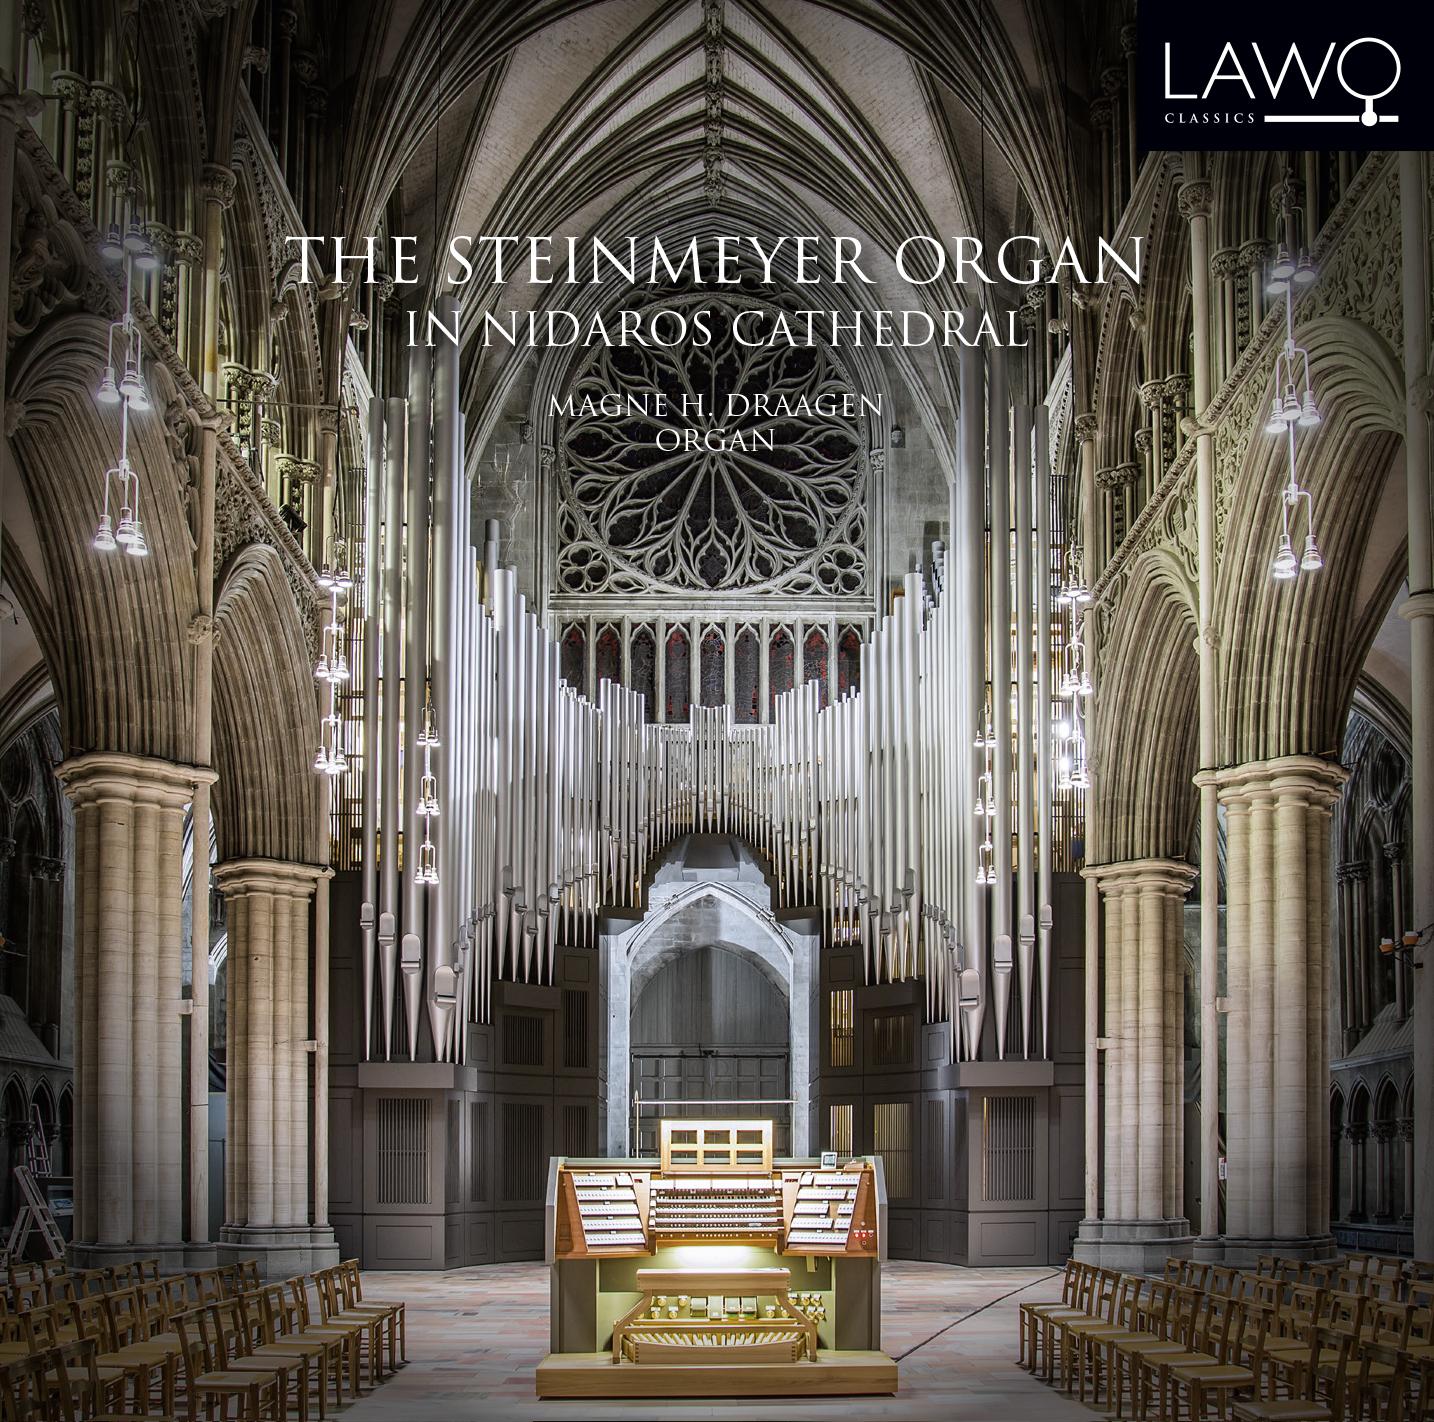 Challenge Records International The Steinmeyer Organ In Nidaros